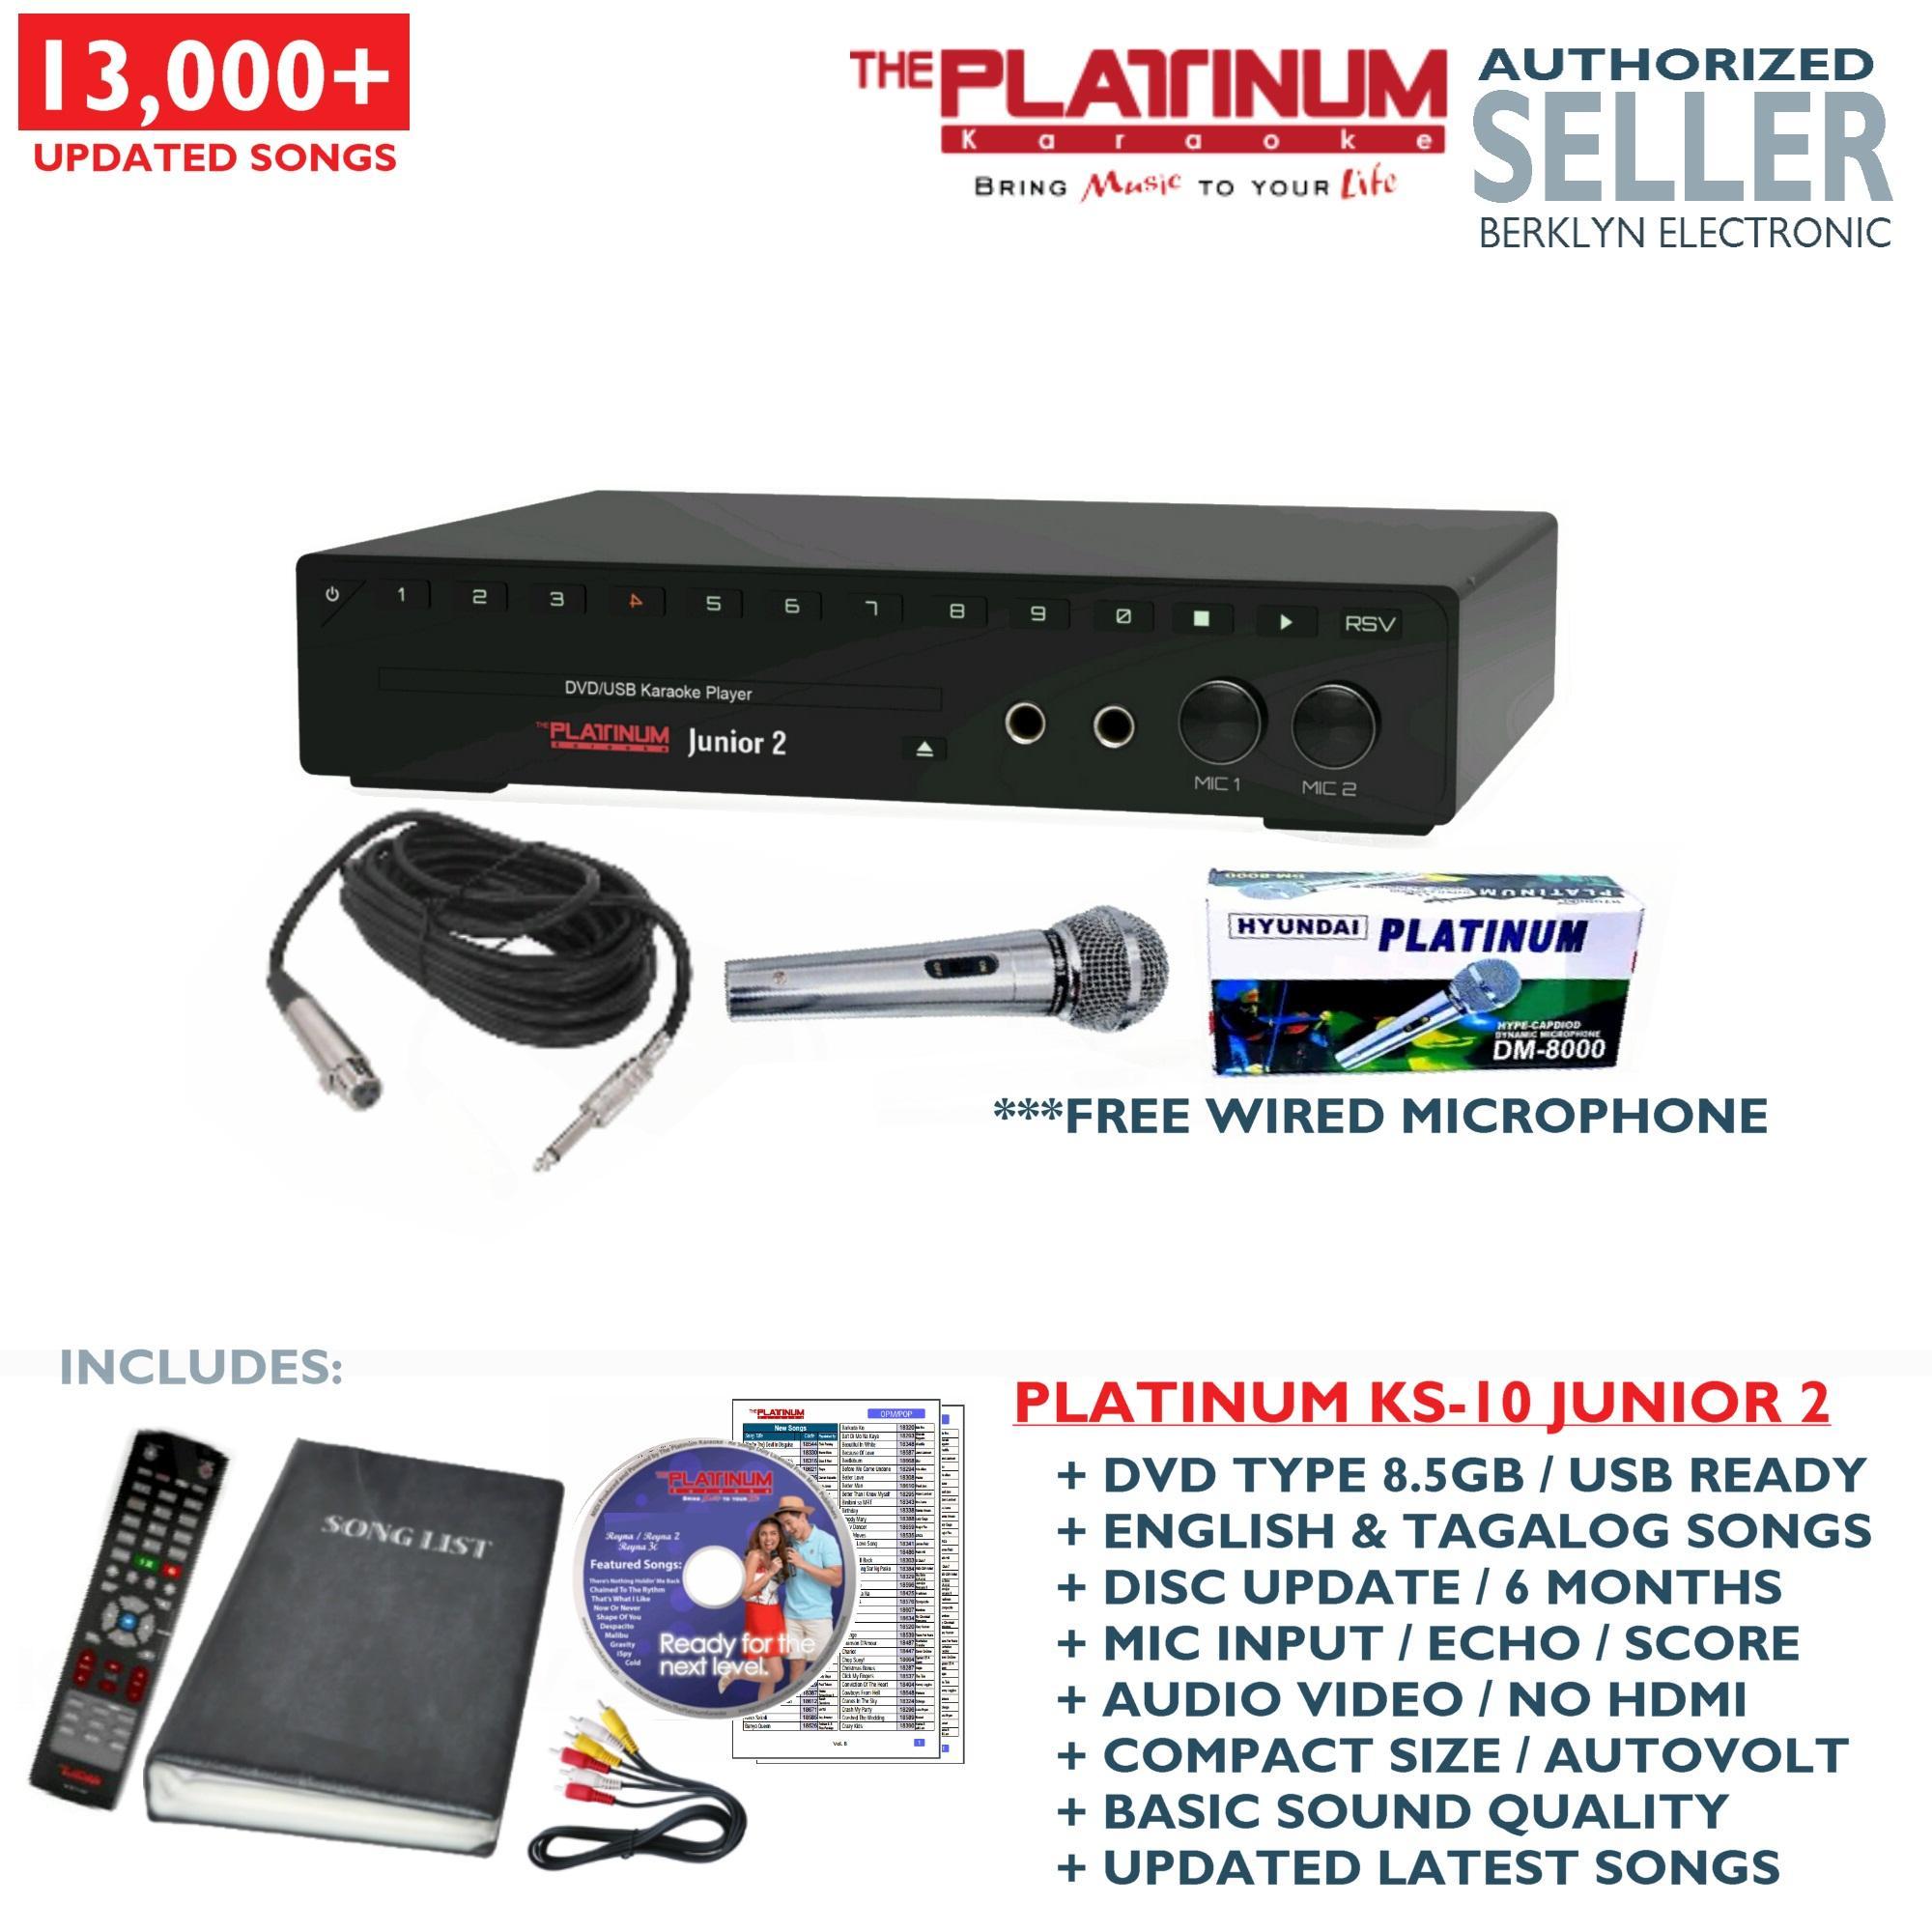 Platinum Philippines Price List Karaoke Player For Sale Videoke Speaker Wiring Ks 10 Junior 2 Dvd Songbook Remote Mic